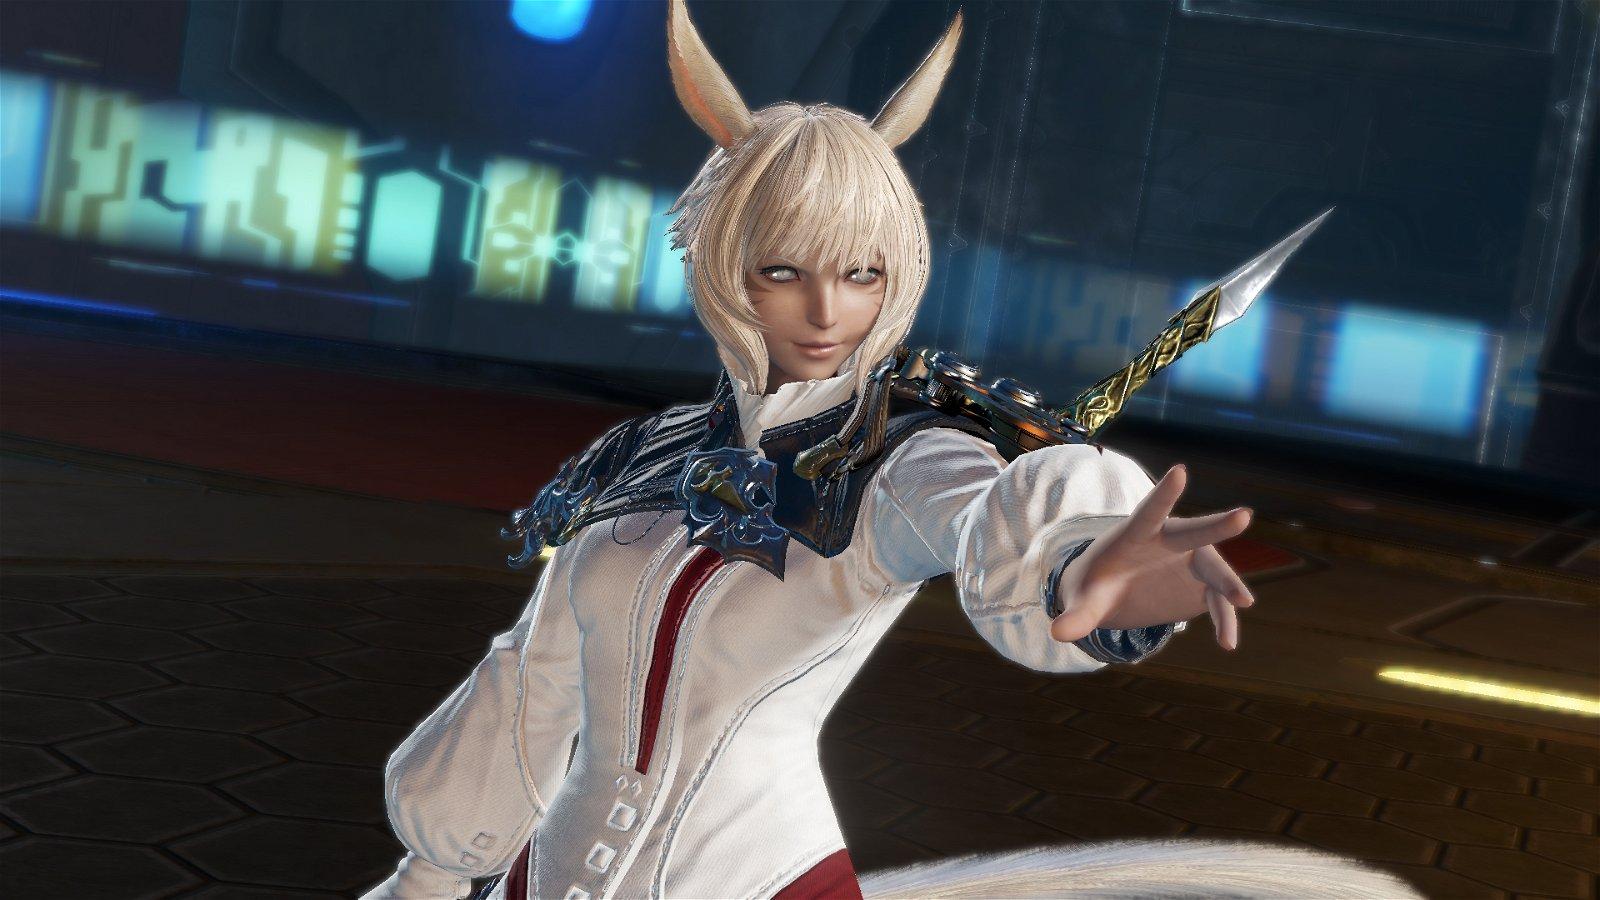 Dissidia Final Fantasy NT (PS4) Preview - Flaccid Fantasy